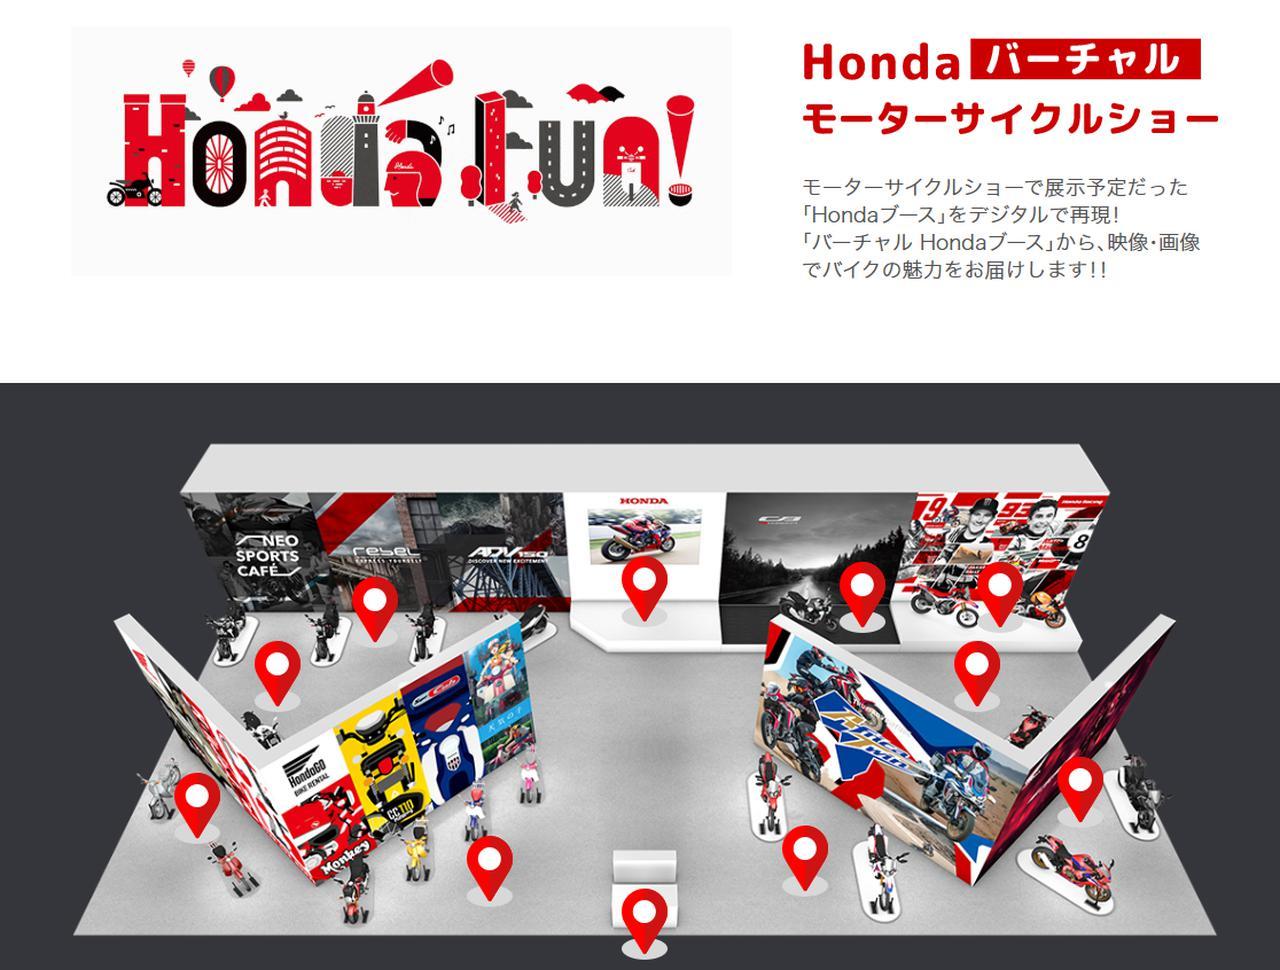 「Honda バーチャルモーターサイクルショー」が3月30日にグランドオープン!